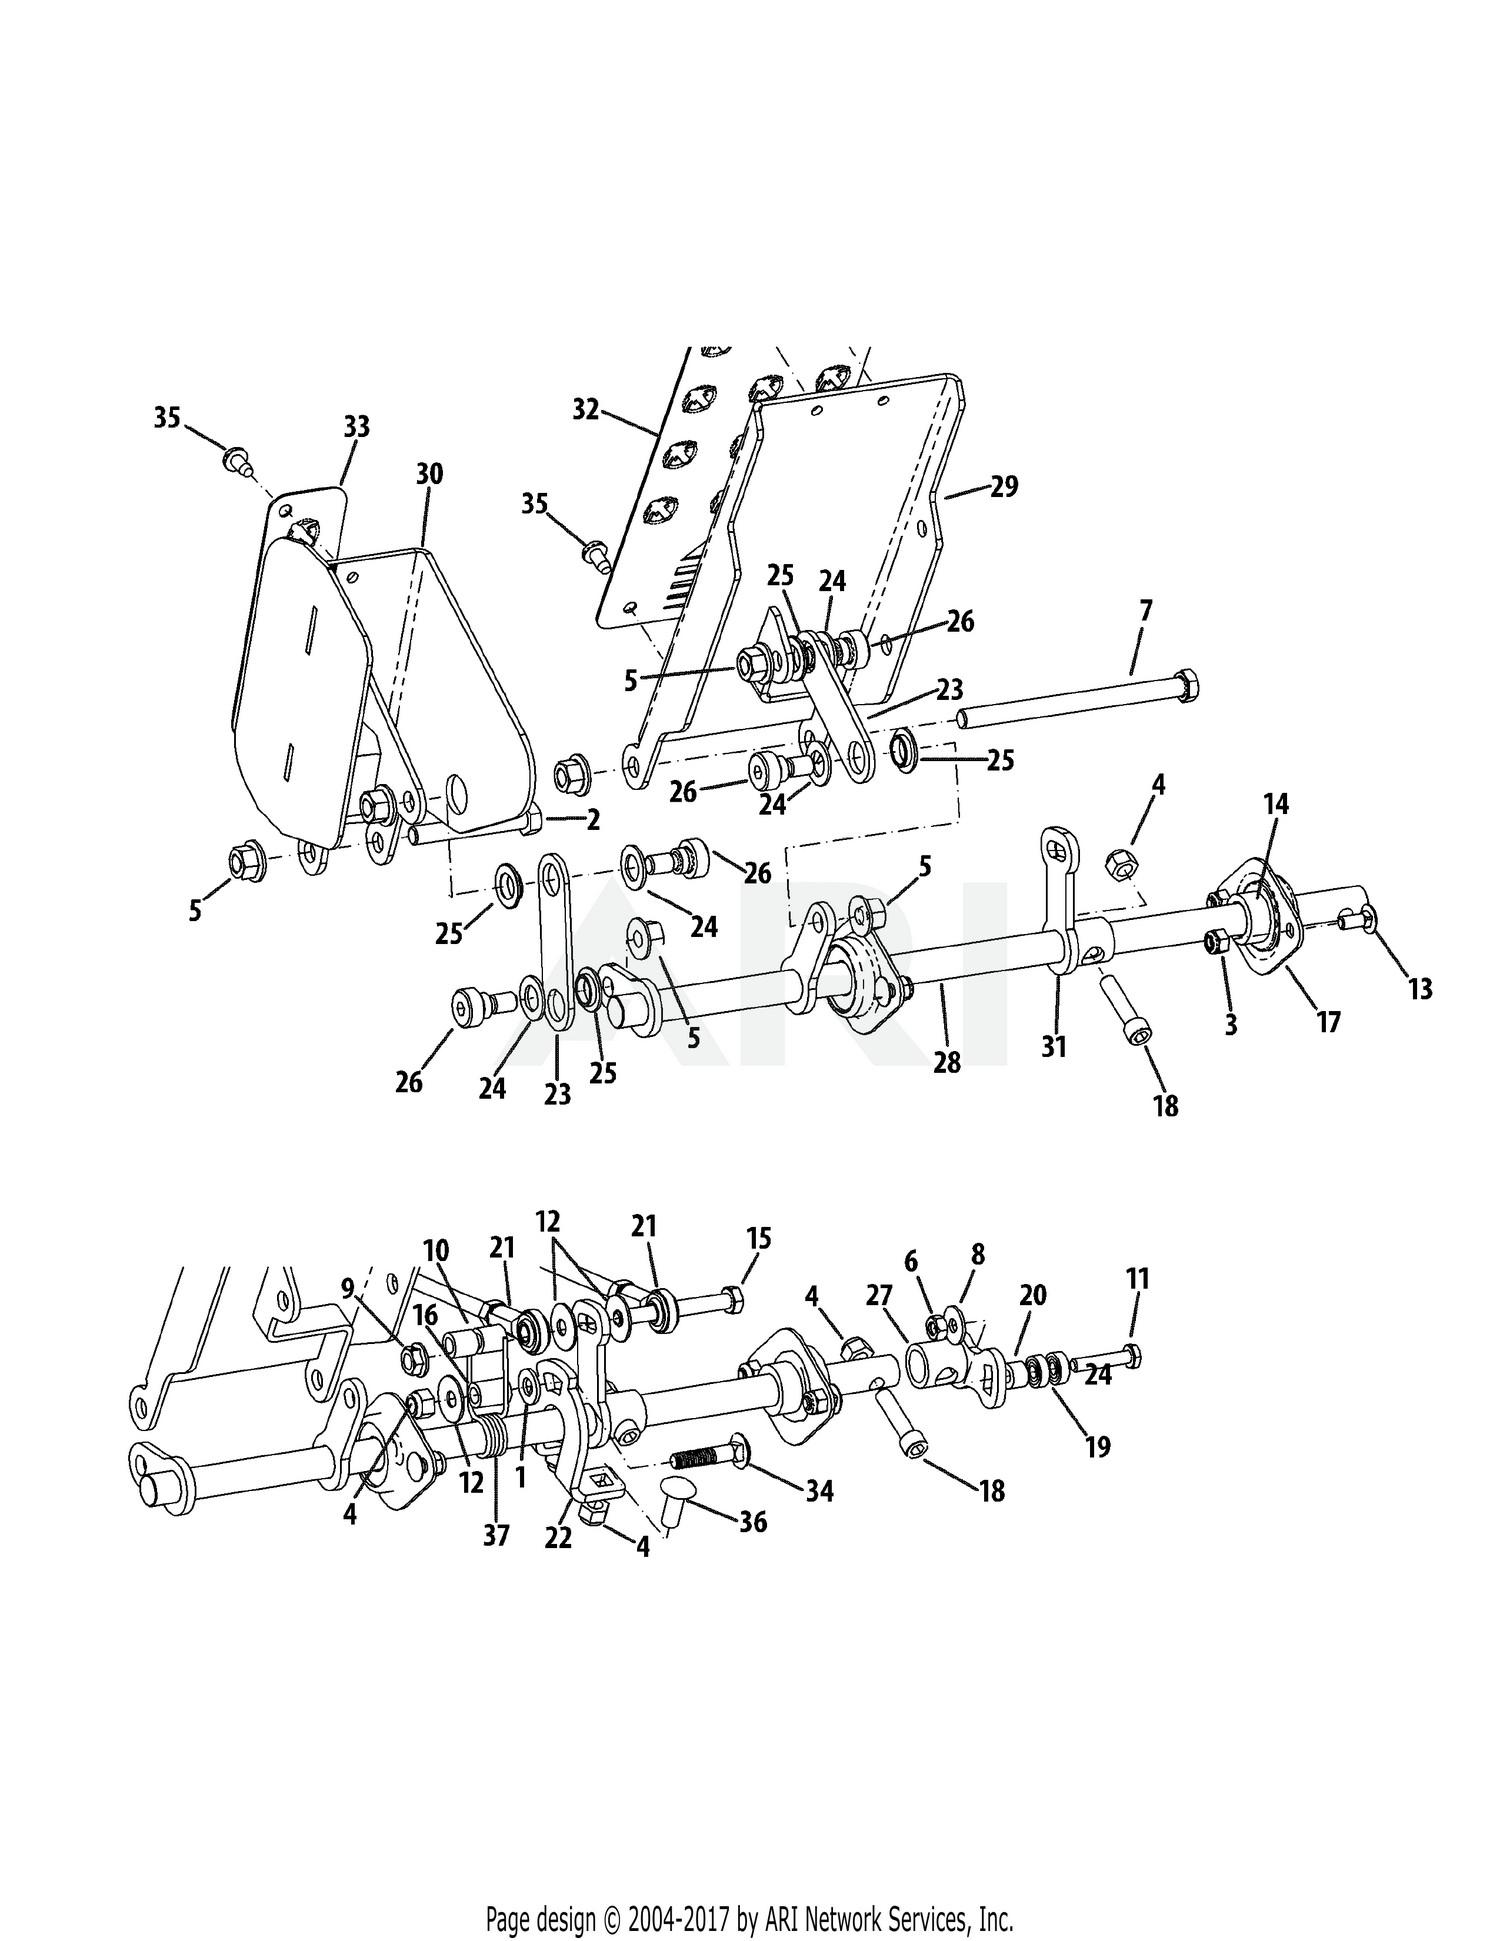 Yanmar Engine Parts Diagram Cub Cadet Parts Diagrams Cub Cadet S6032 D 53ay8du6050 Tank S Of Yanmar Engine Parts Diagram